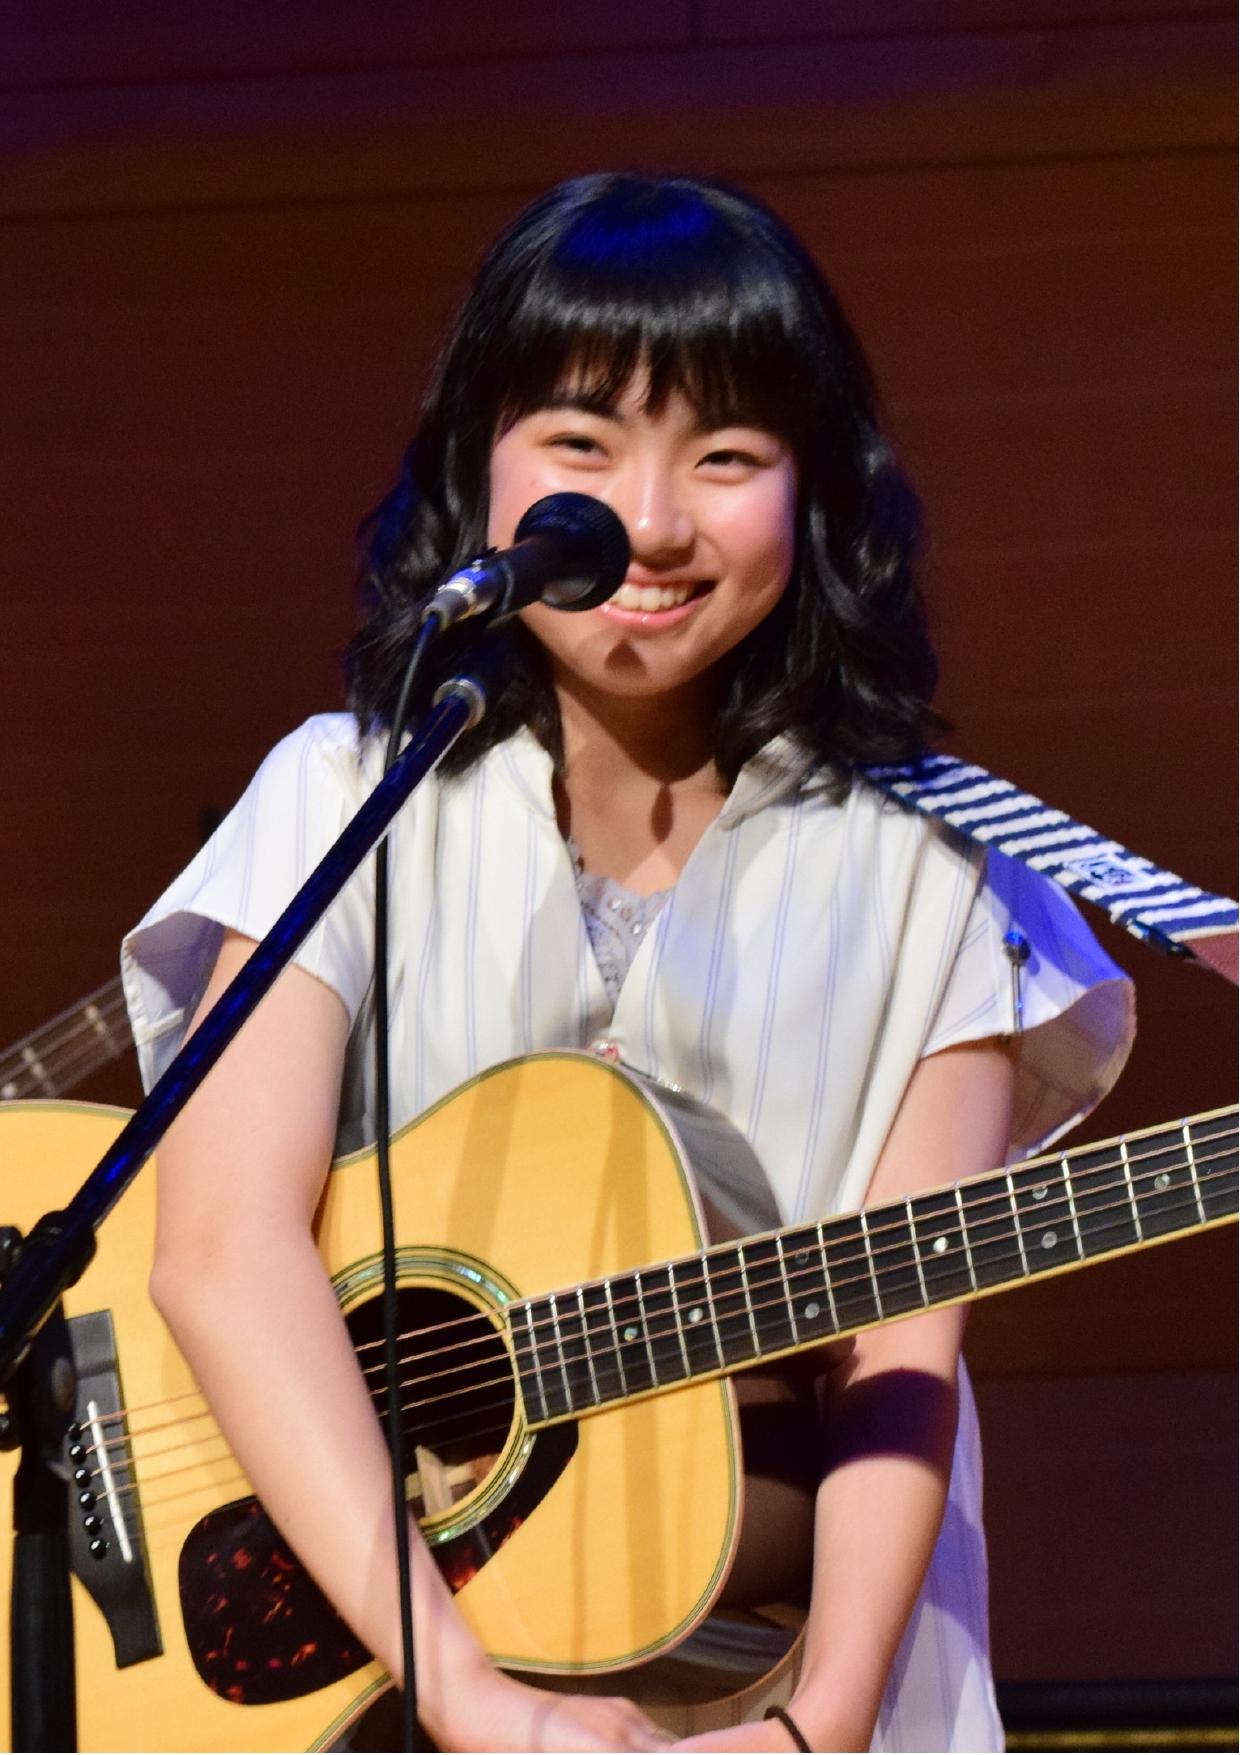 10099_AYUKO_page-0001.jpg